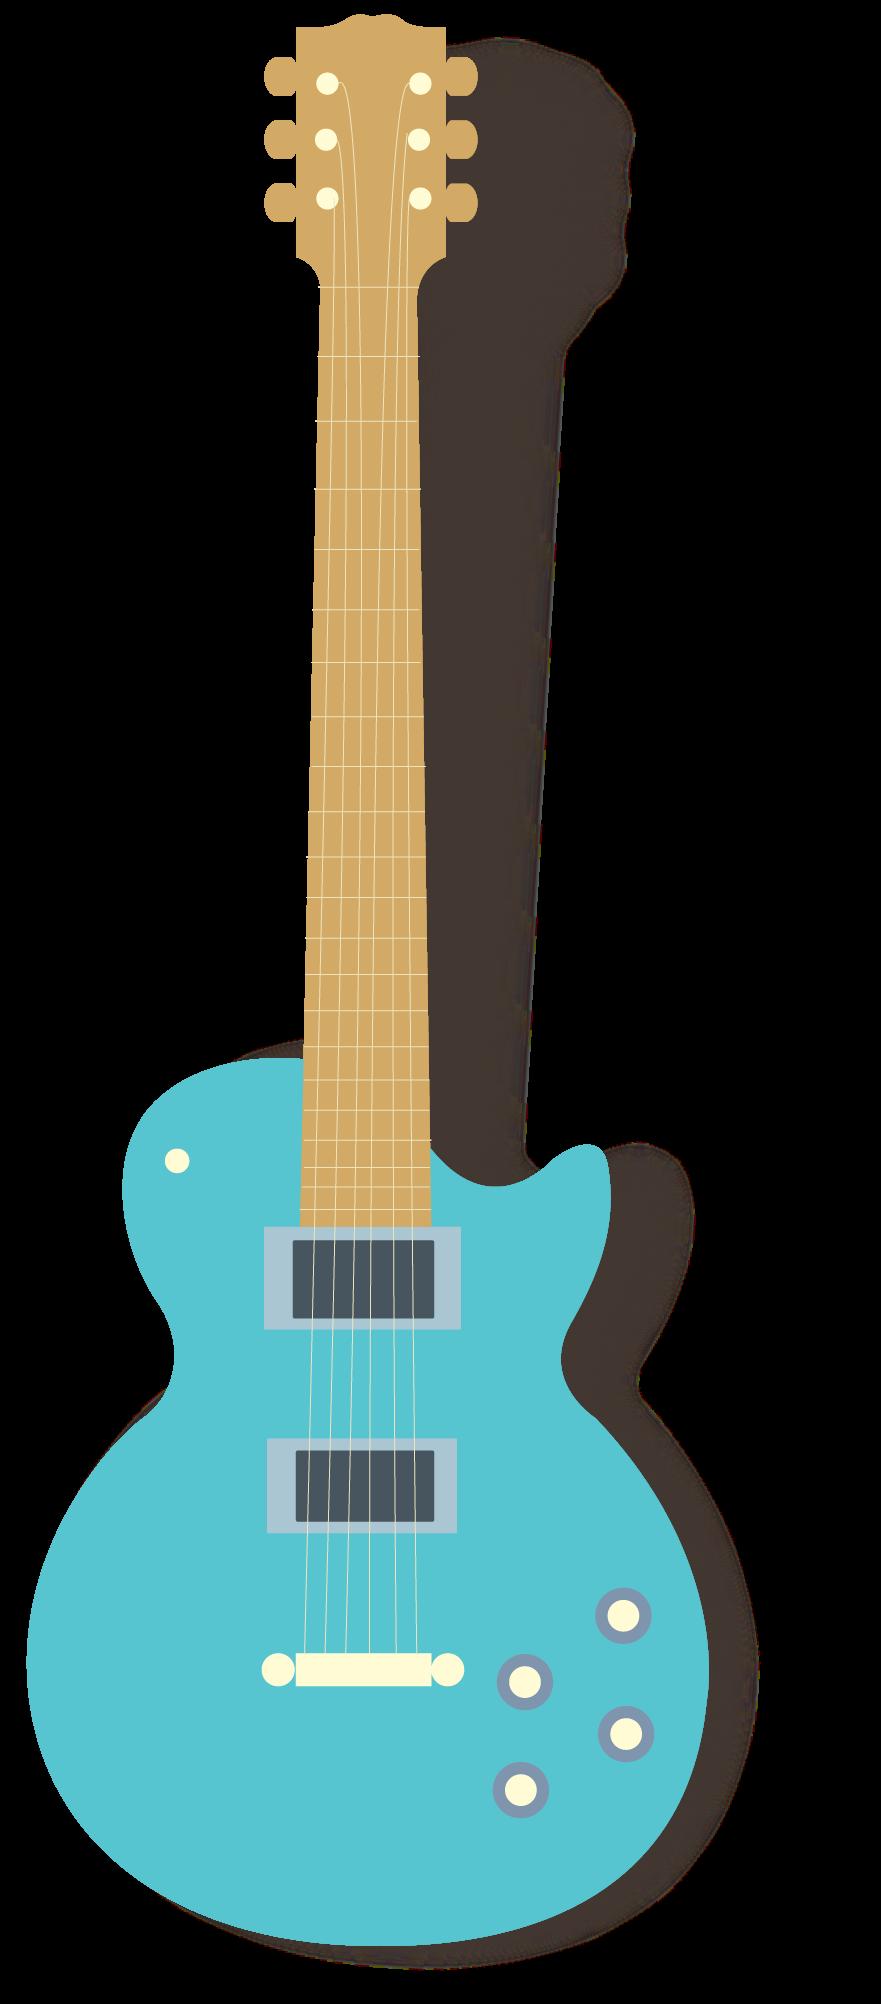 Png transparent free images. Clipart guitar guitar piano